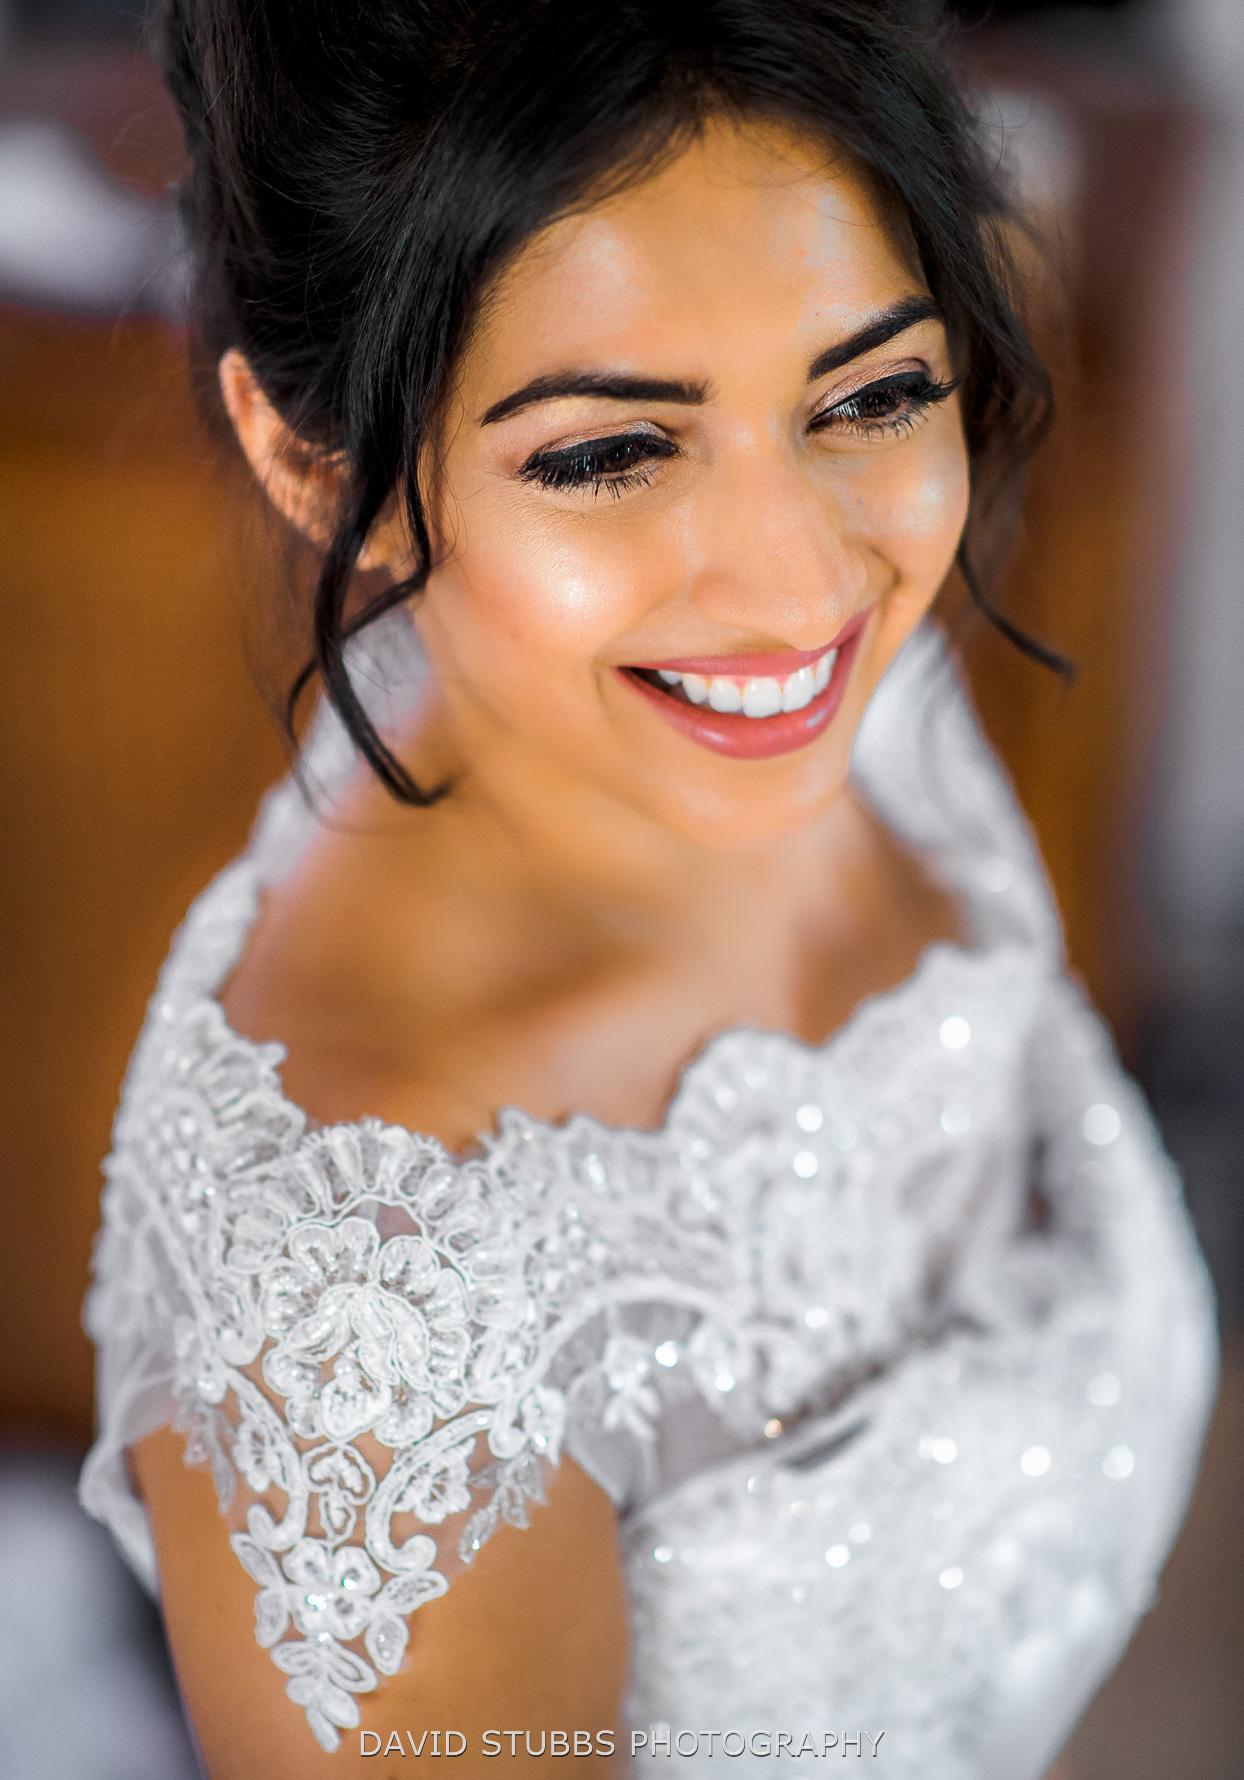 protrait of the bride